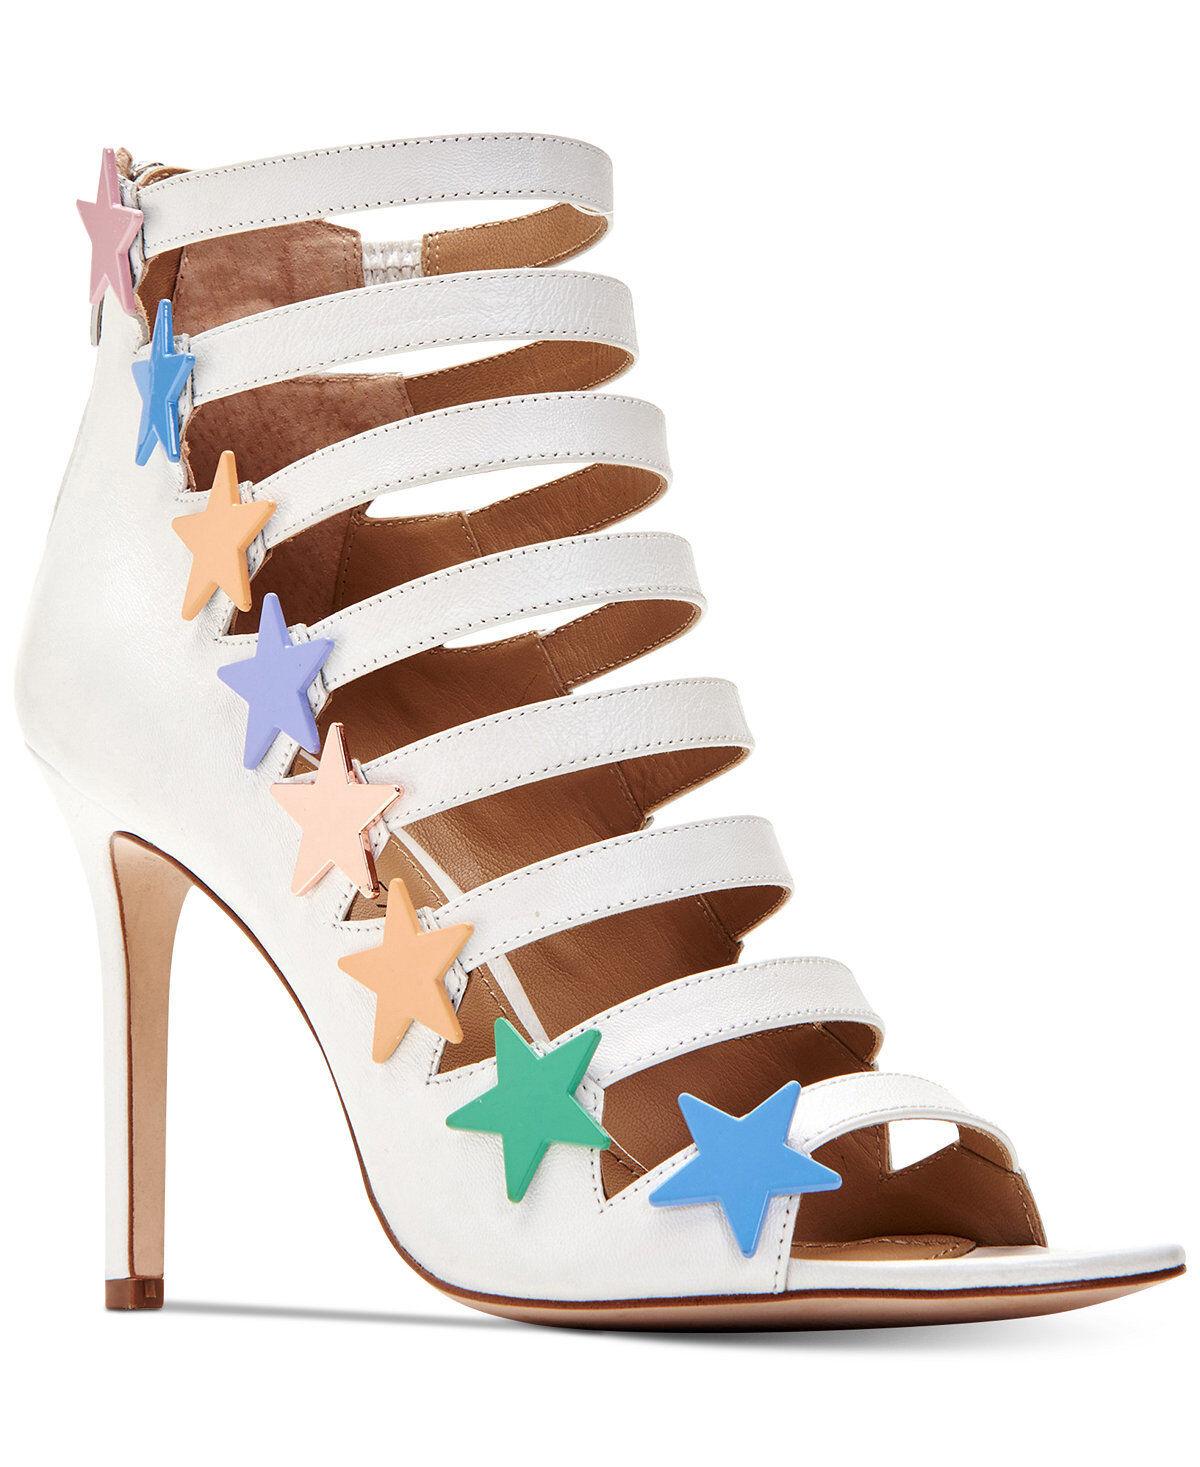 NIB Katy Perry Donna Stella Heeled White w Starts Studded Sandal Sz 8.5M  139